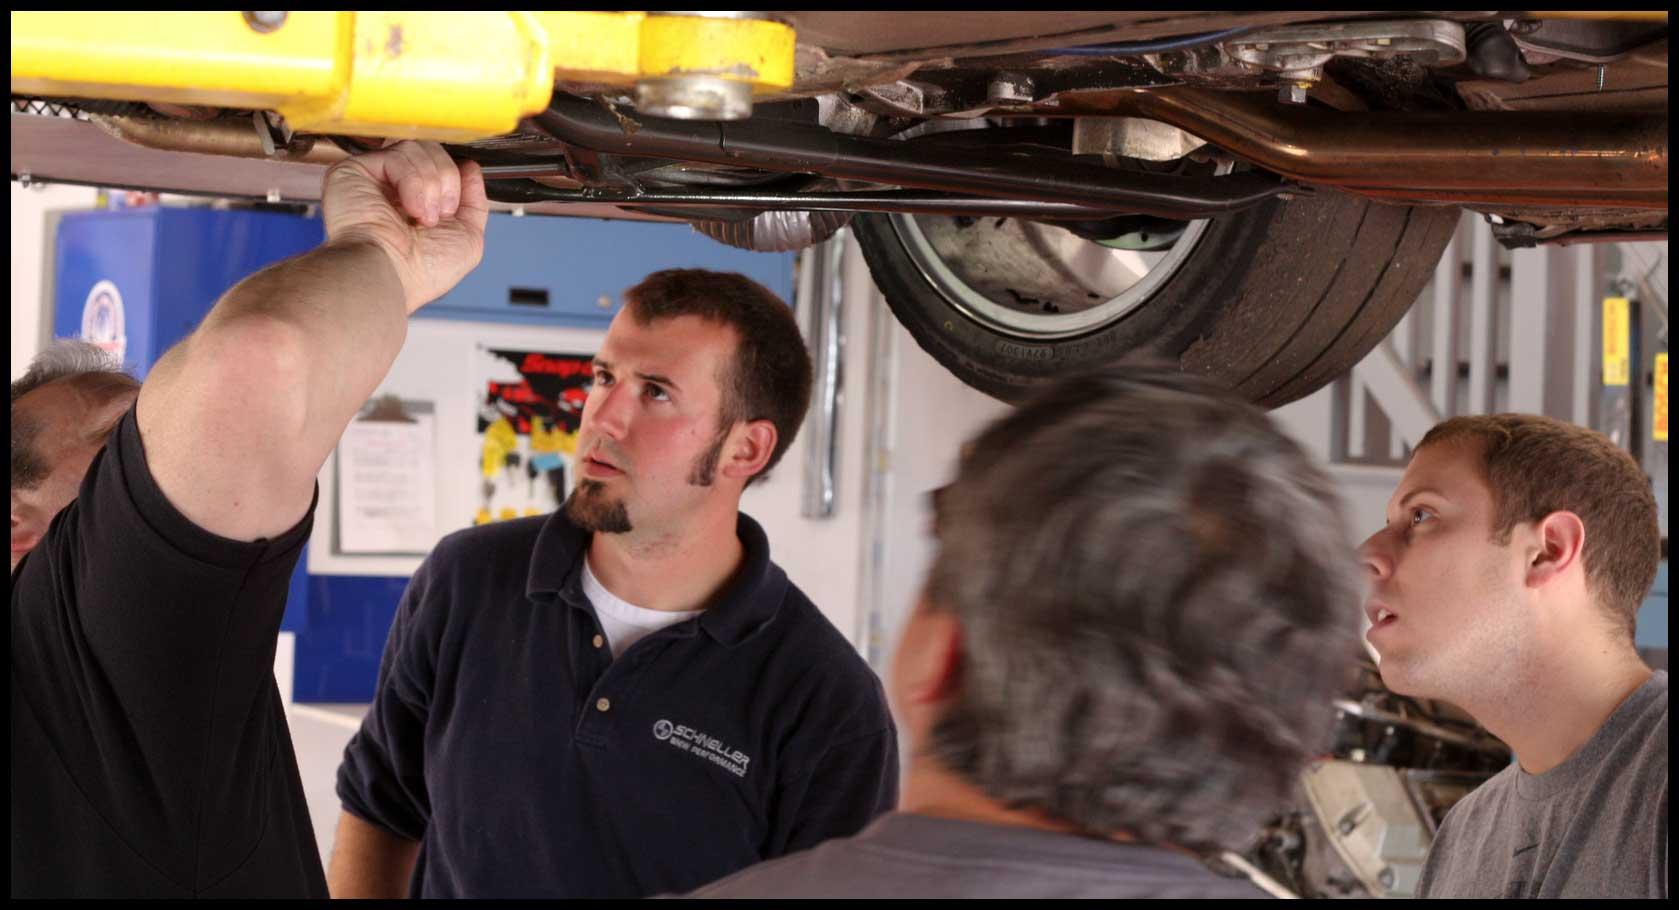 Schneller-BMW-MINI-Rusty-Brake-Rotors